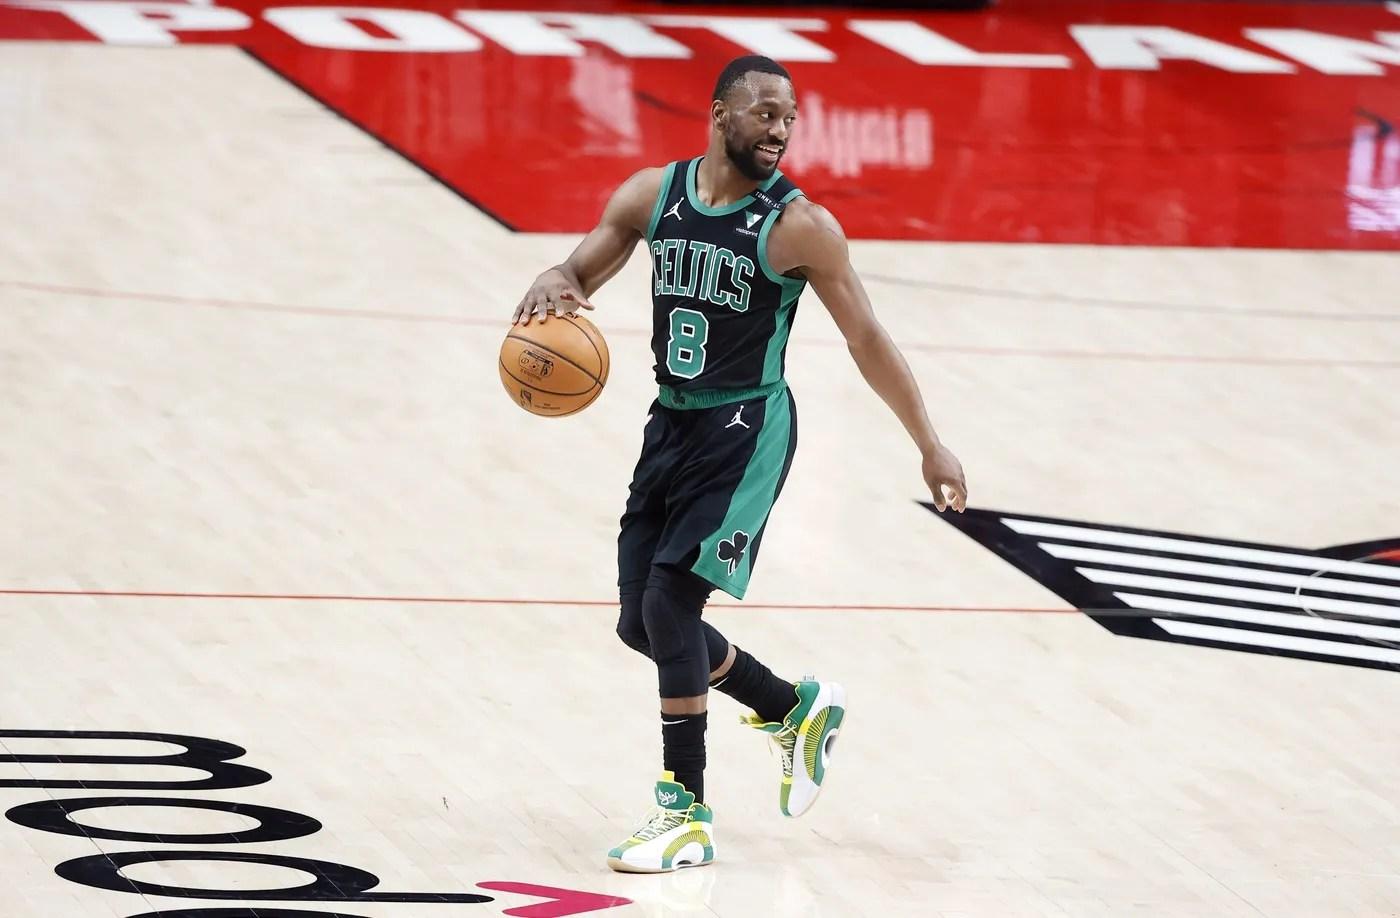 Apr 13, 2021; Portland, Oregon, USA; Boston Celtics point guard Kemba Walker (8) controls the ball against the Portland Trail Blazers during the second half at Moda Center.